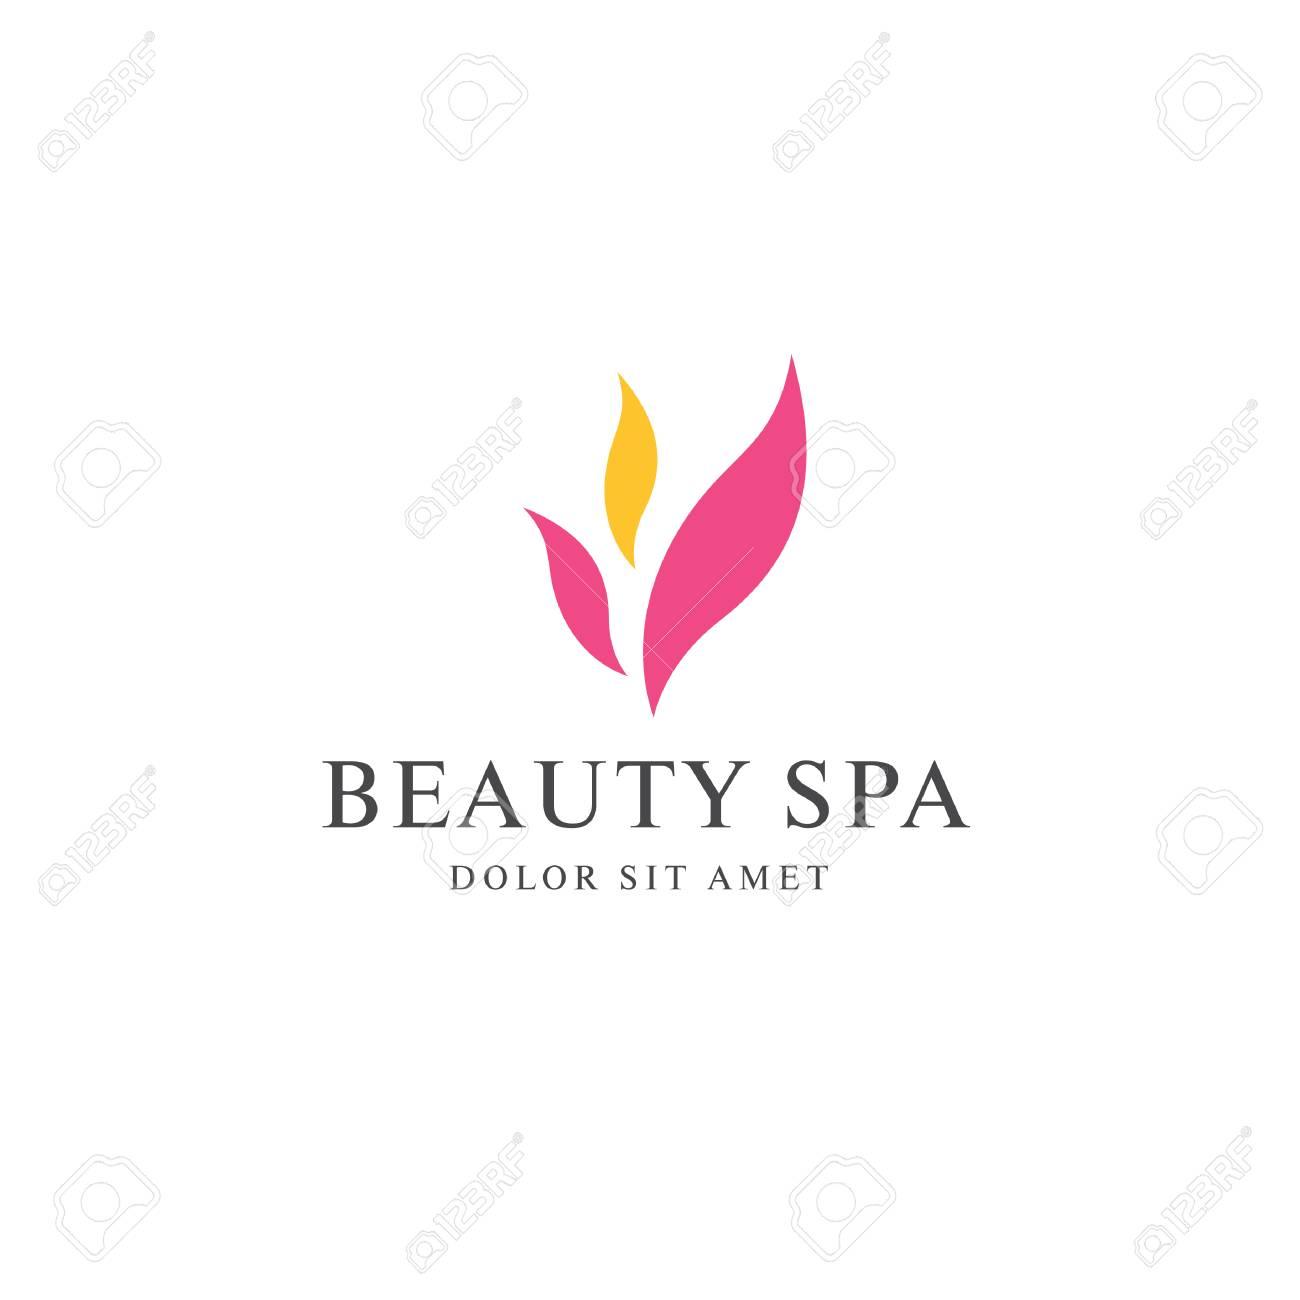 Beauty Spa Logo Design Royalty Free Cliparts Vectors And Stock